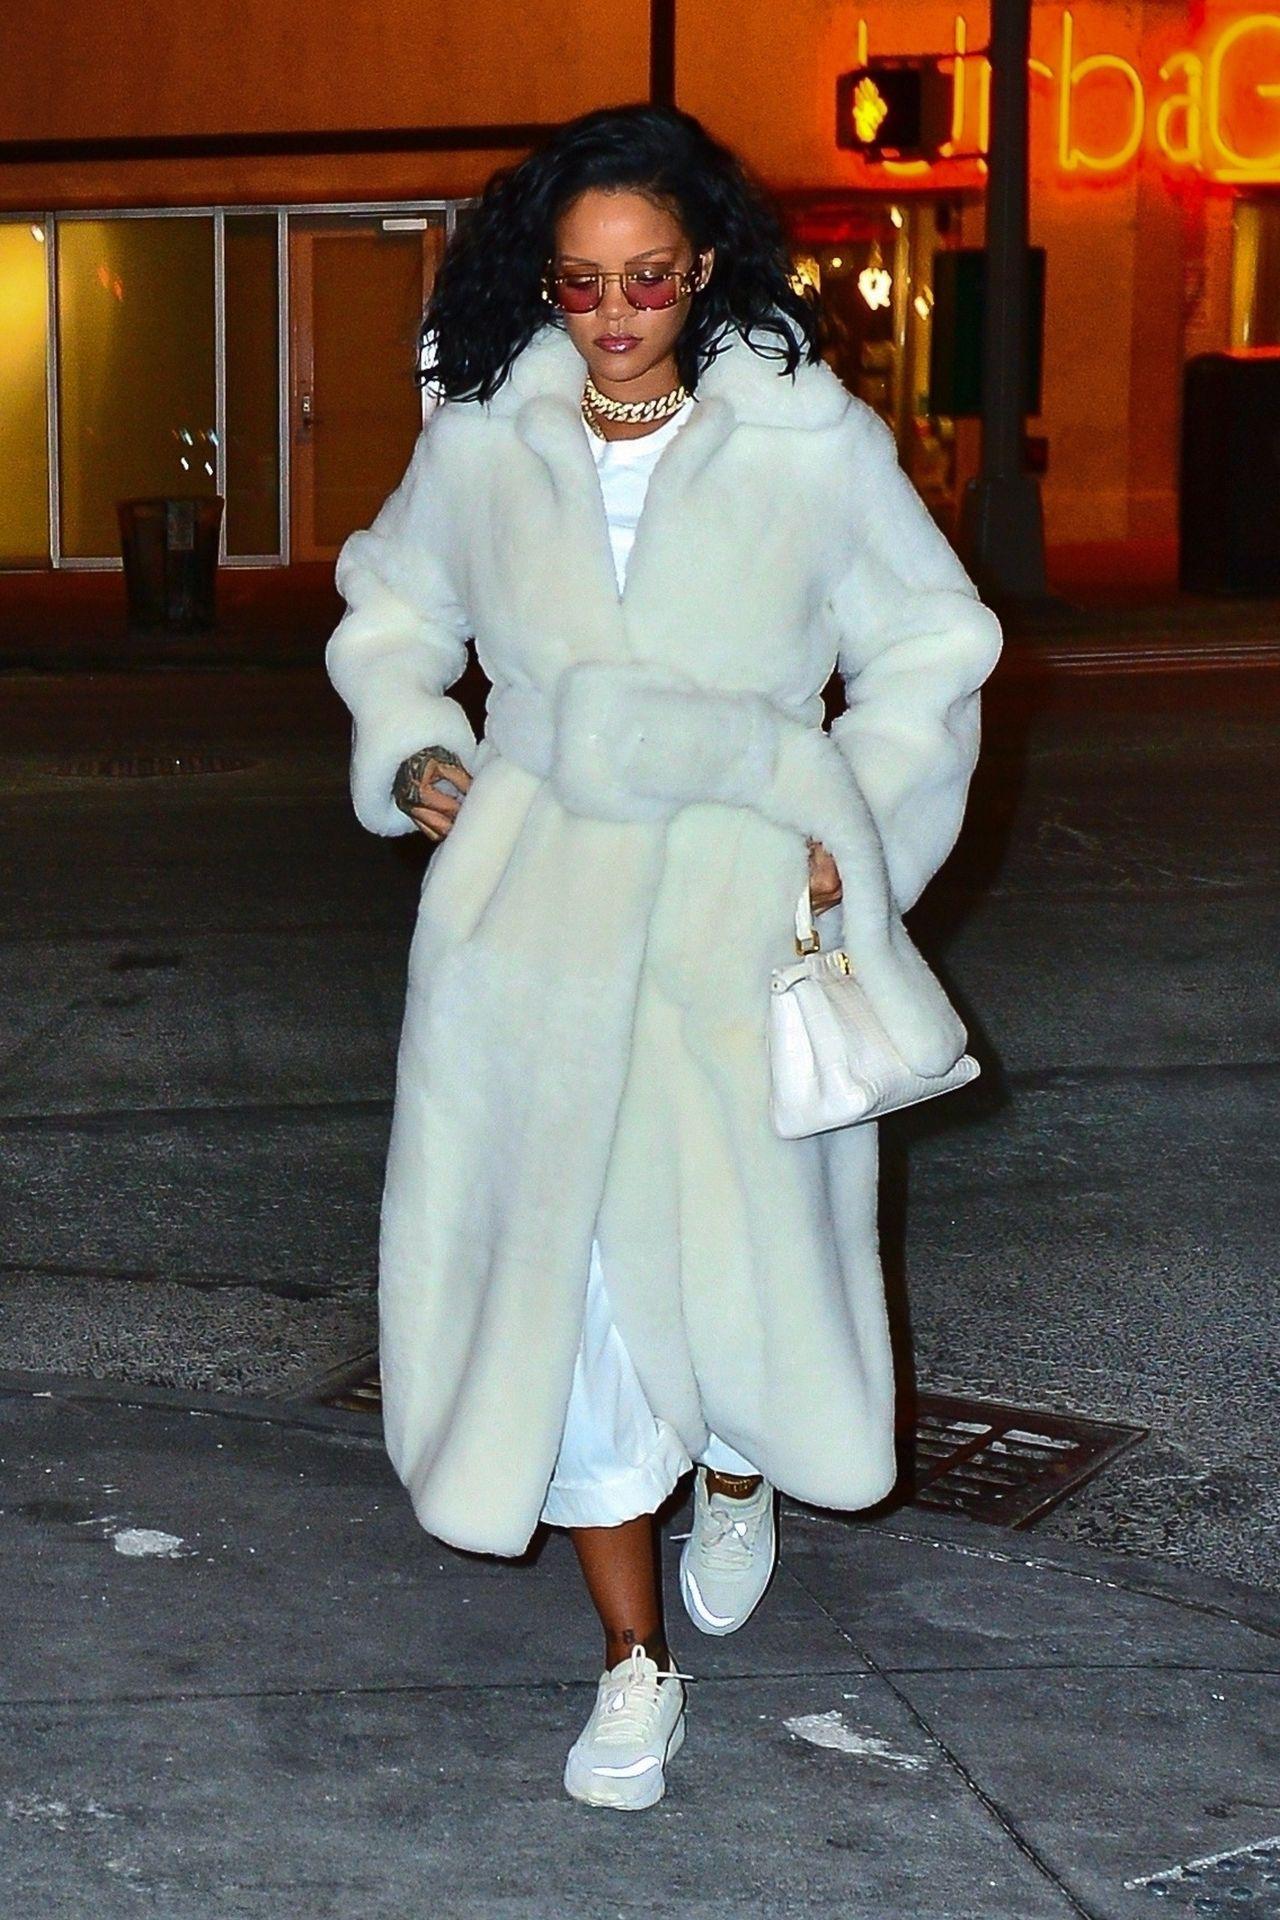 Pół internetu chce mieć takie futerko, jak ma Rihanna